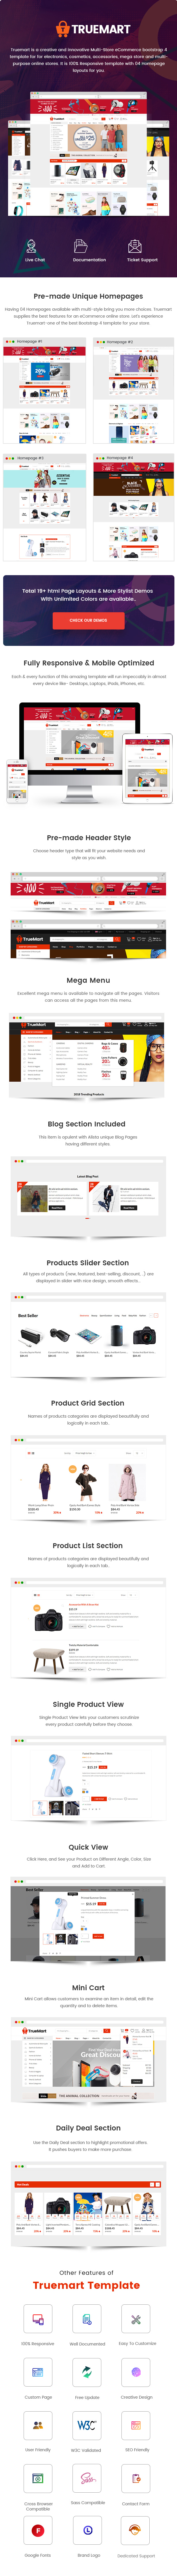 Truemart - Fashion Electronics Store HTML Template - 1